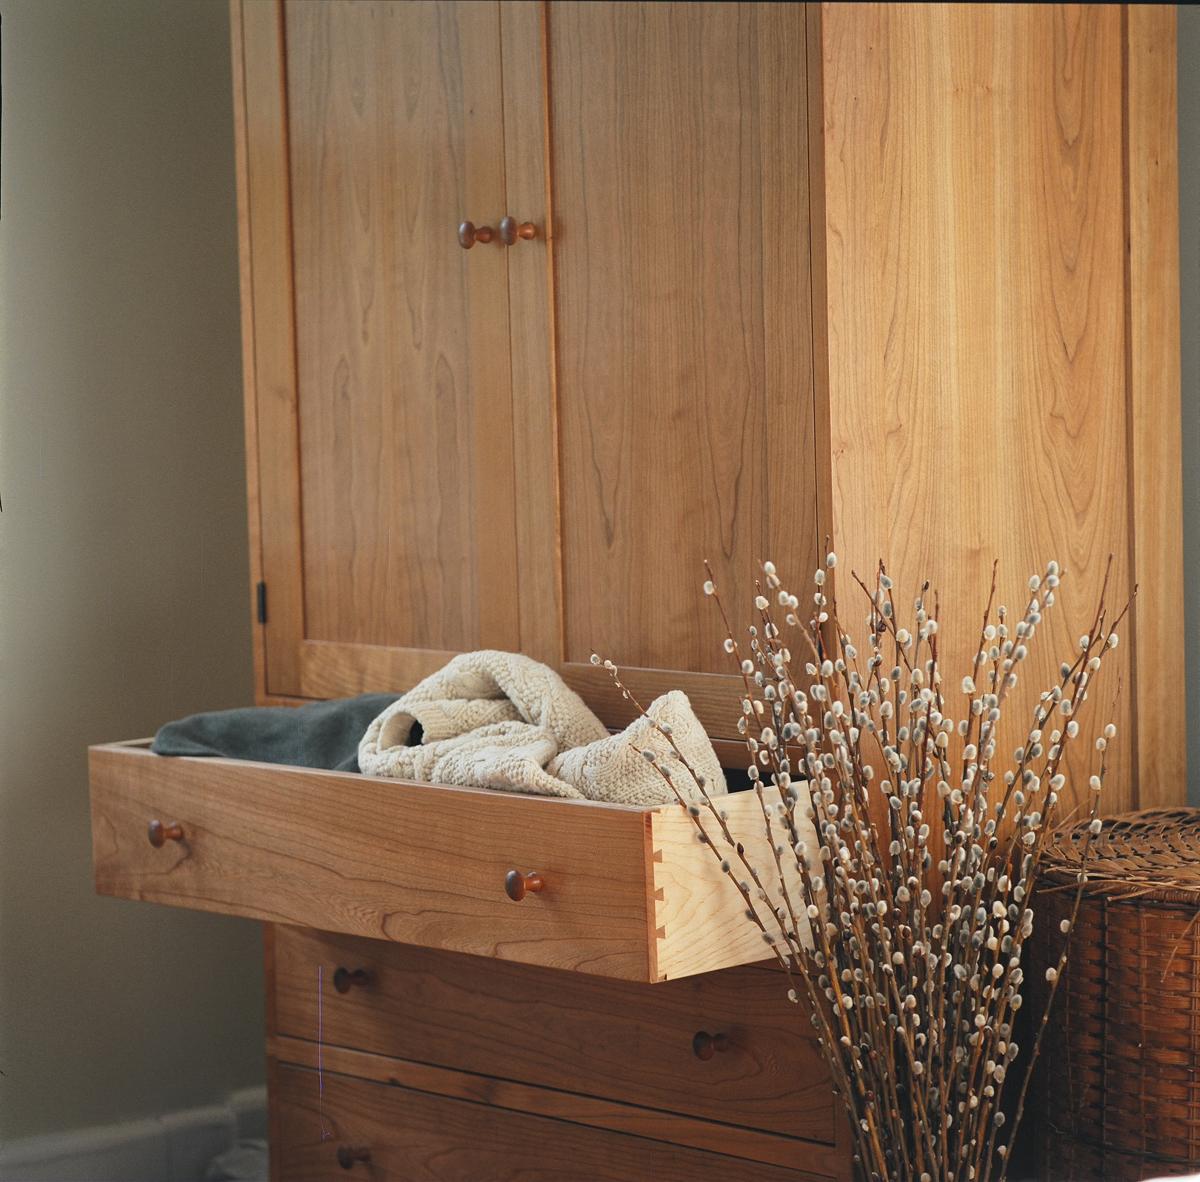 wardrobe-drawer-chest-vertical-dresser-bedroom-furniture